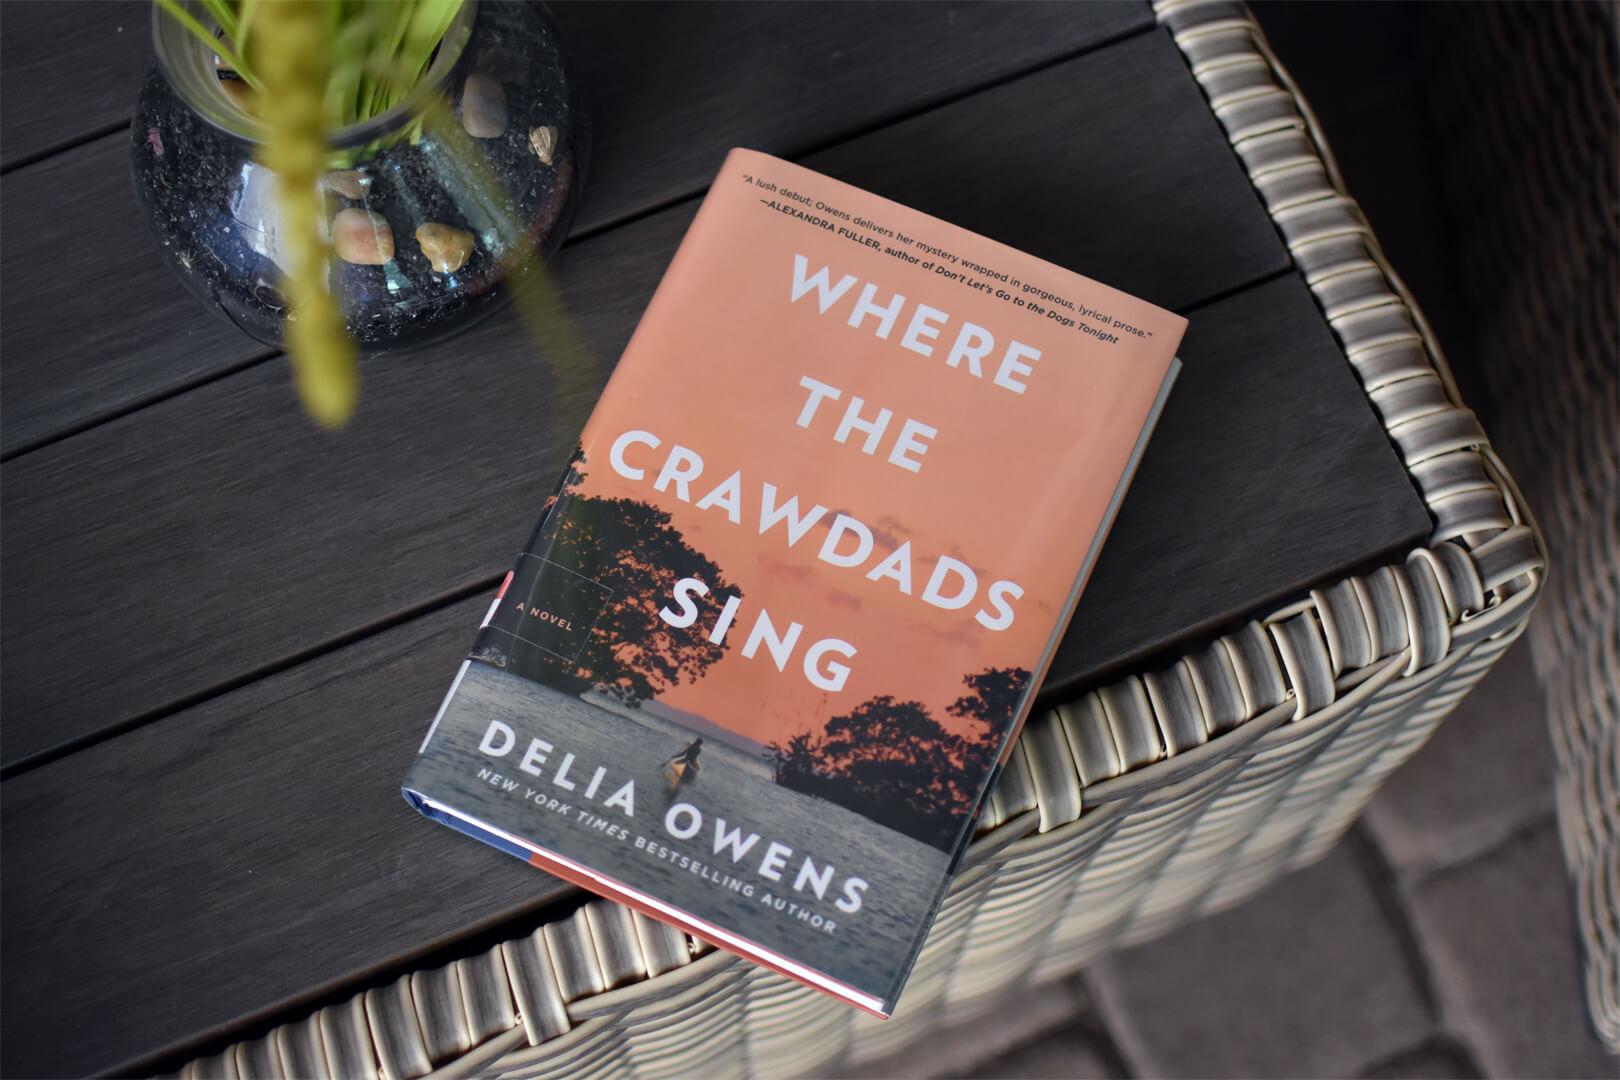 Where-The-Crawdads-Sing-Book-Club-Questions-Book-Club-Chat.jpg